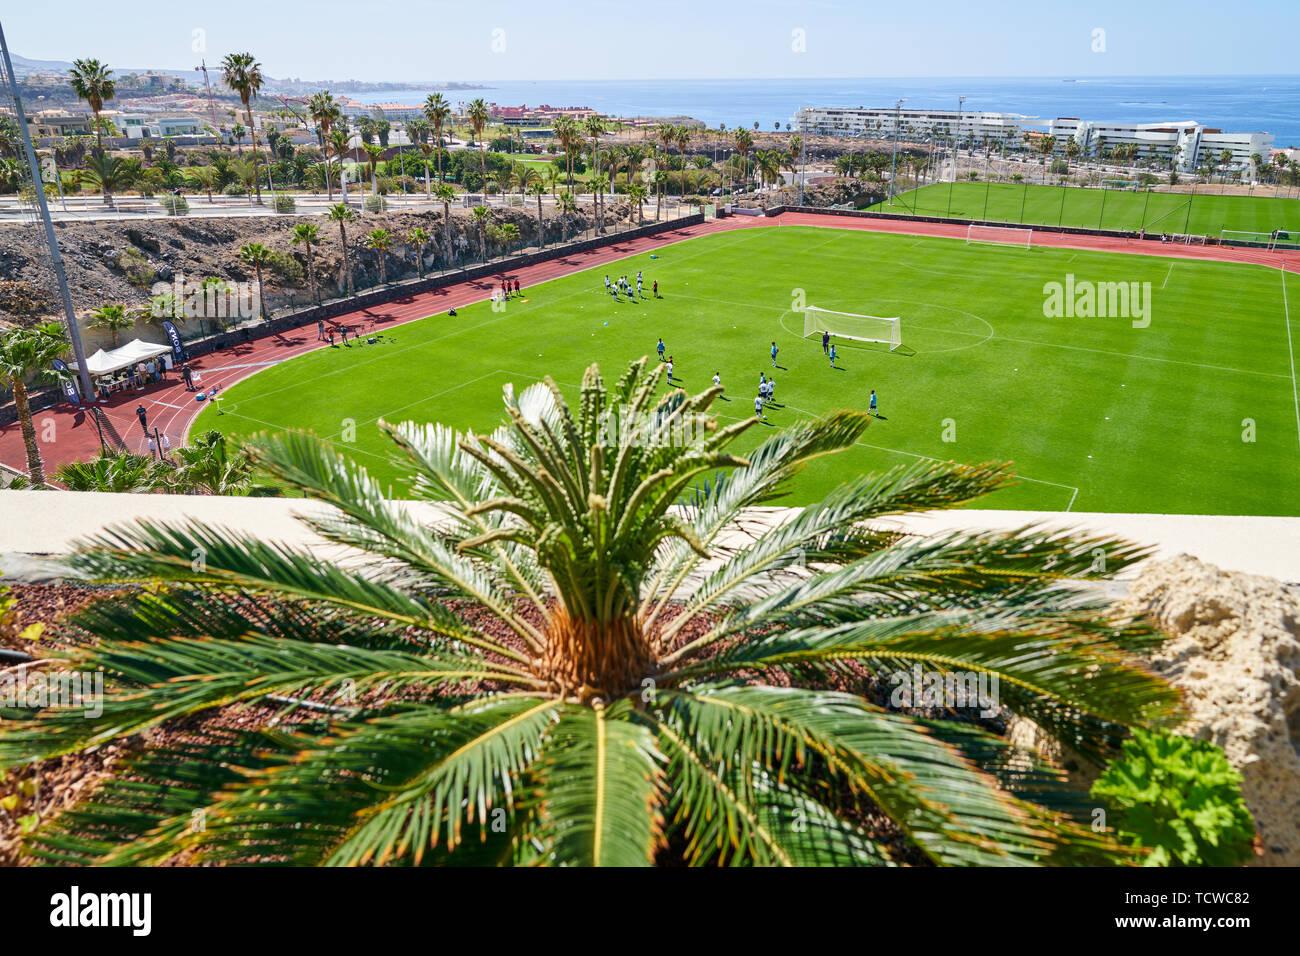 Tenerife Top Training, athletes training center in Santa Cruz de Tenerife, Tenerife, Spain, March 17, 2019. © Peter Schatz / Alamy Stock Photos - Stock Image